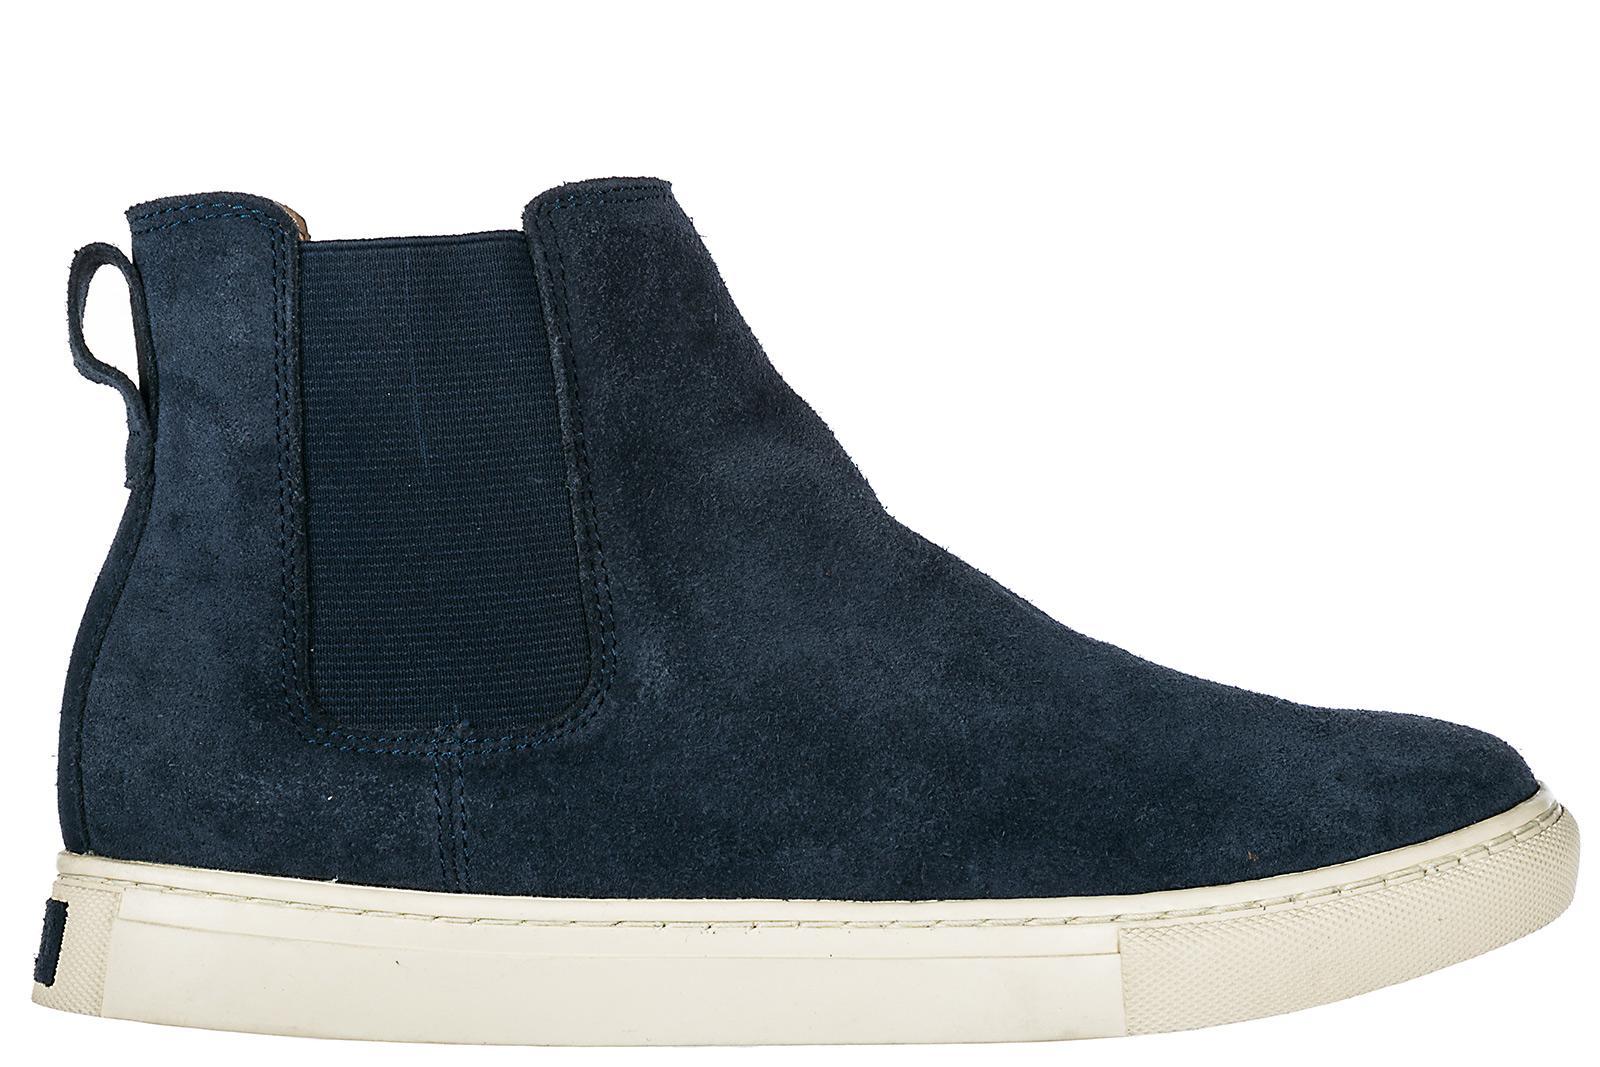 Polo Ralph Lauren Men's Suede Desert Boots Lace Up Ankle Boots Jonny In Blue